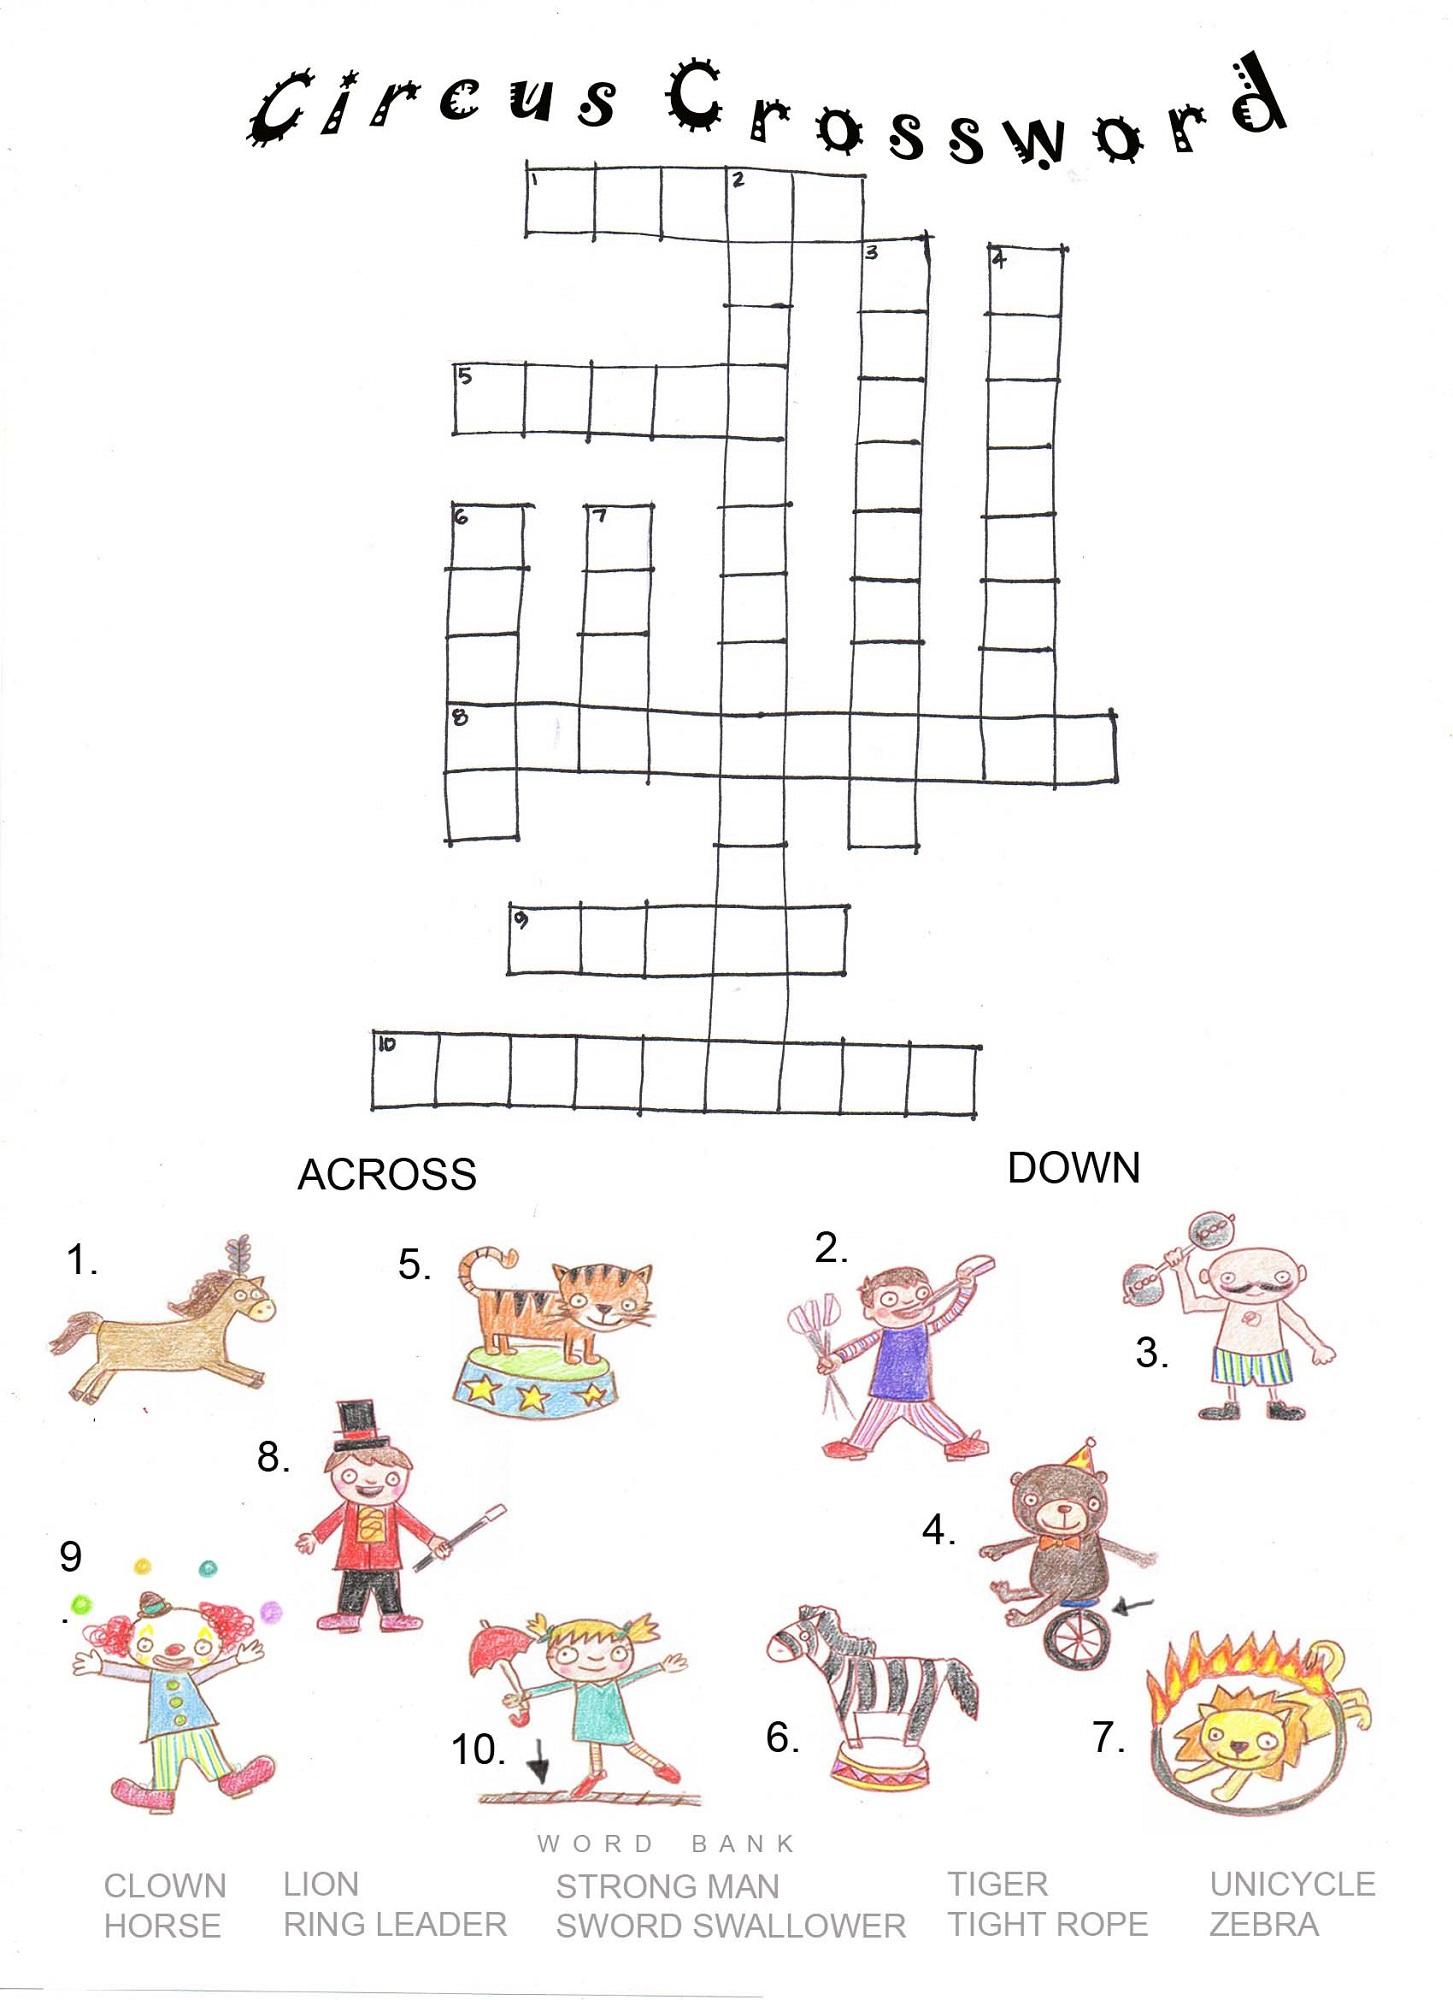 Printable Crosswords Puzzles Kids | Activity Shelter - Printable Horse Crossword Puzzles